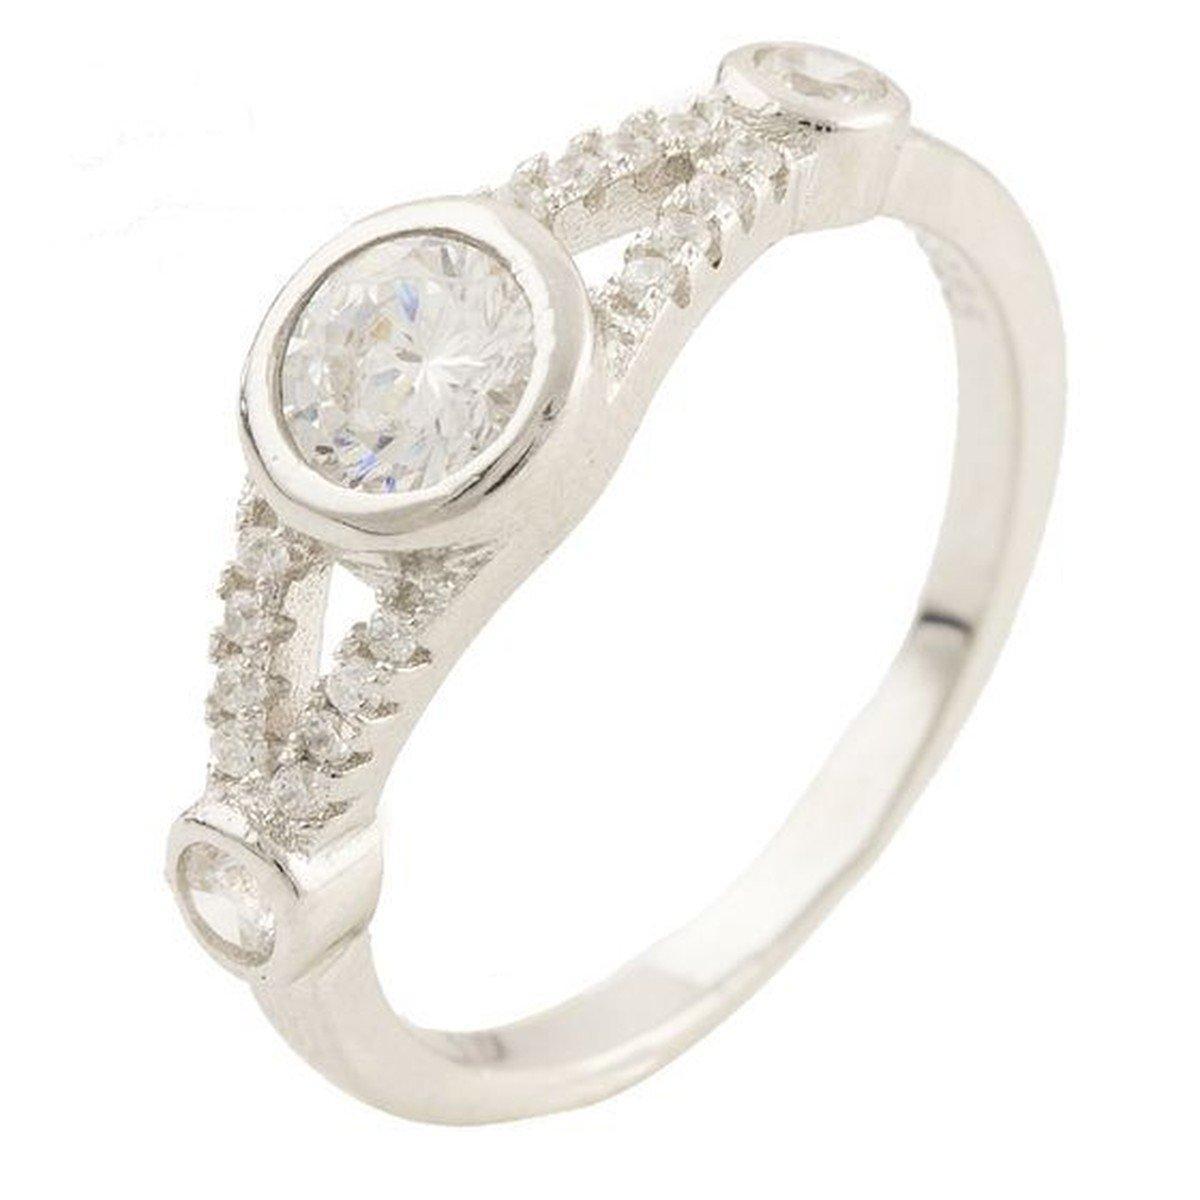 Серебряное кольцо DreamJewelry с фианитами (1160435) 18 размер